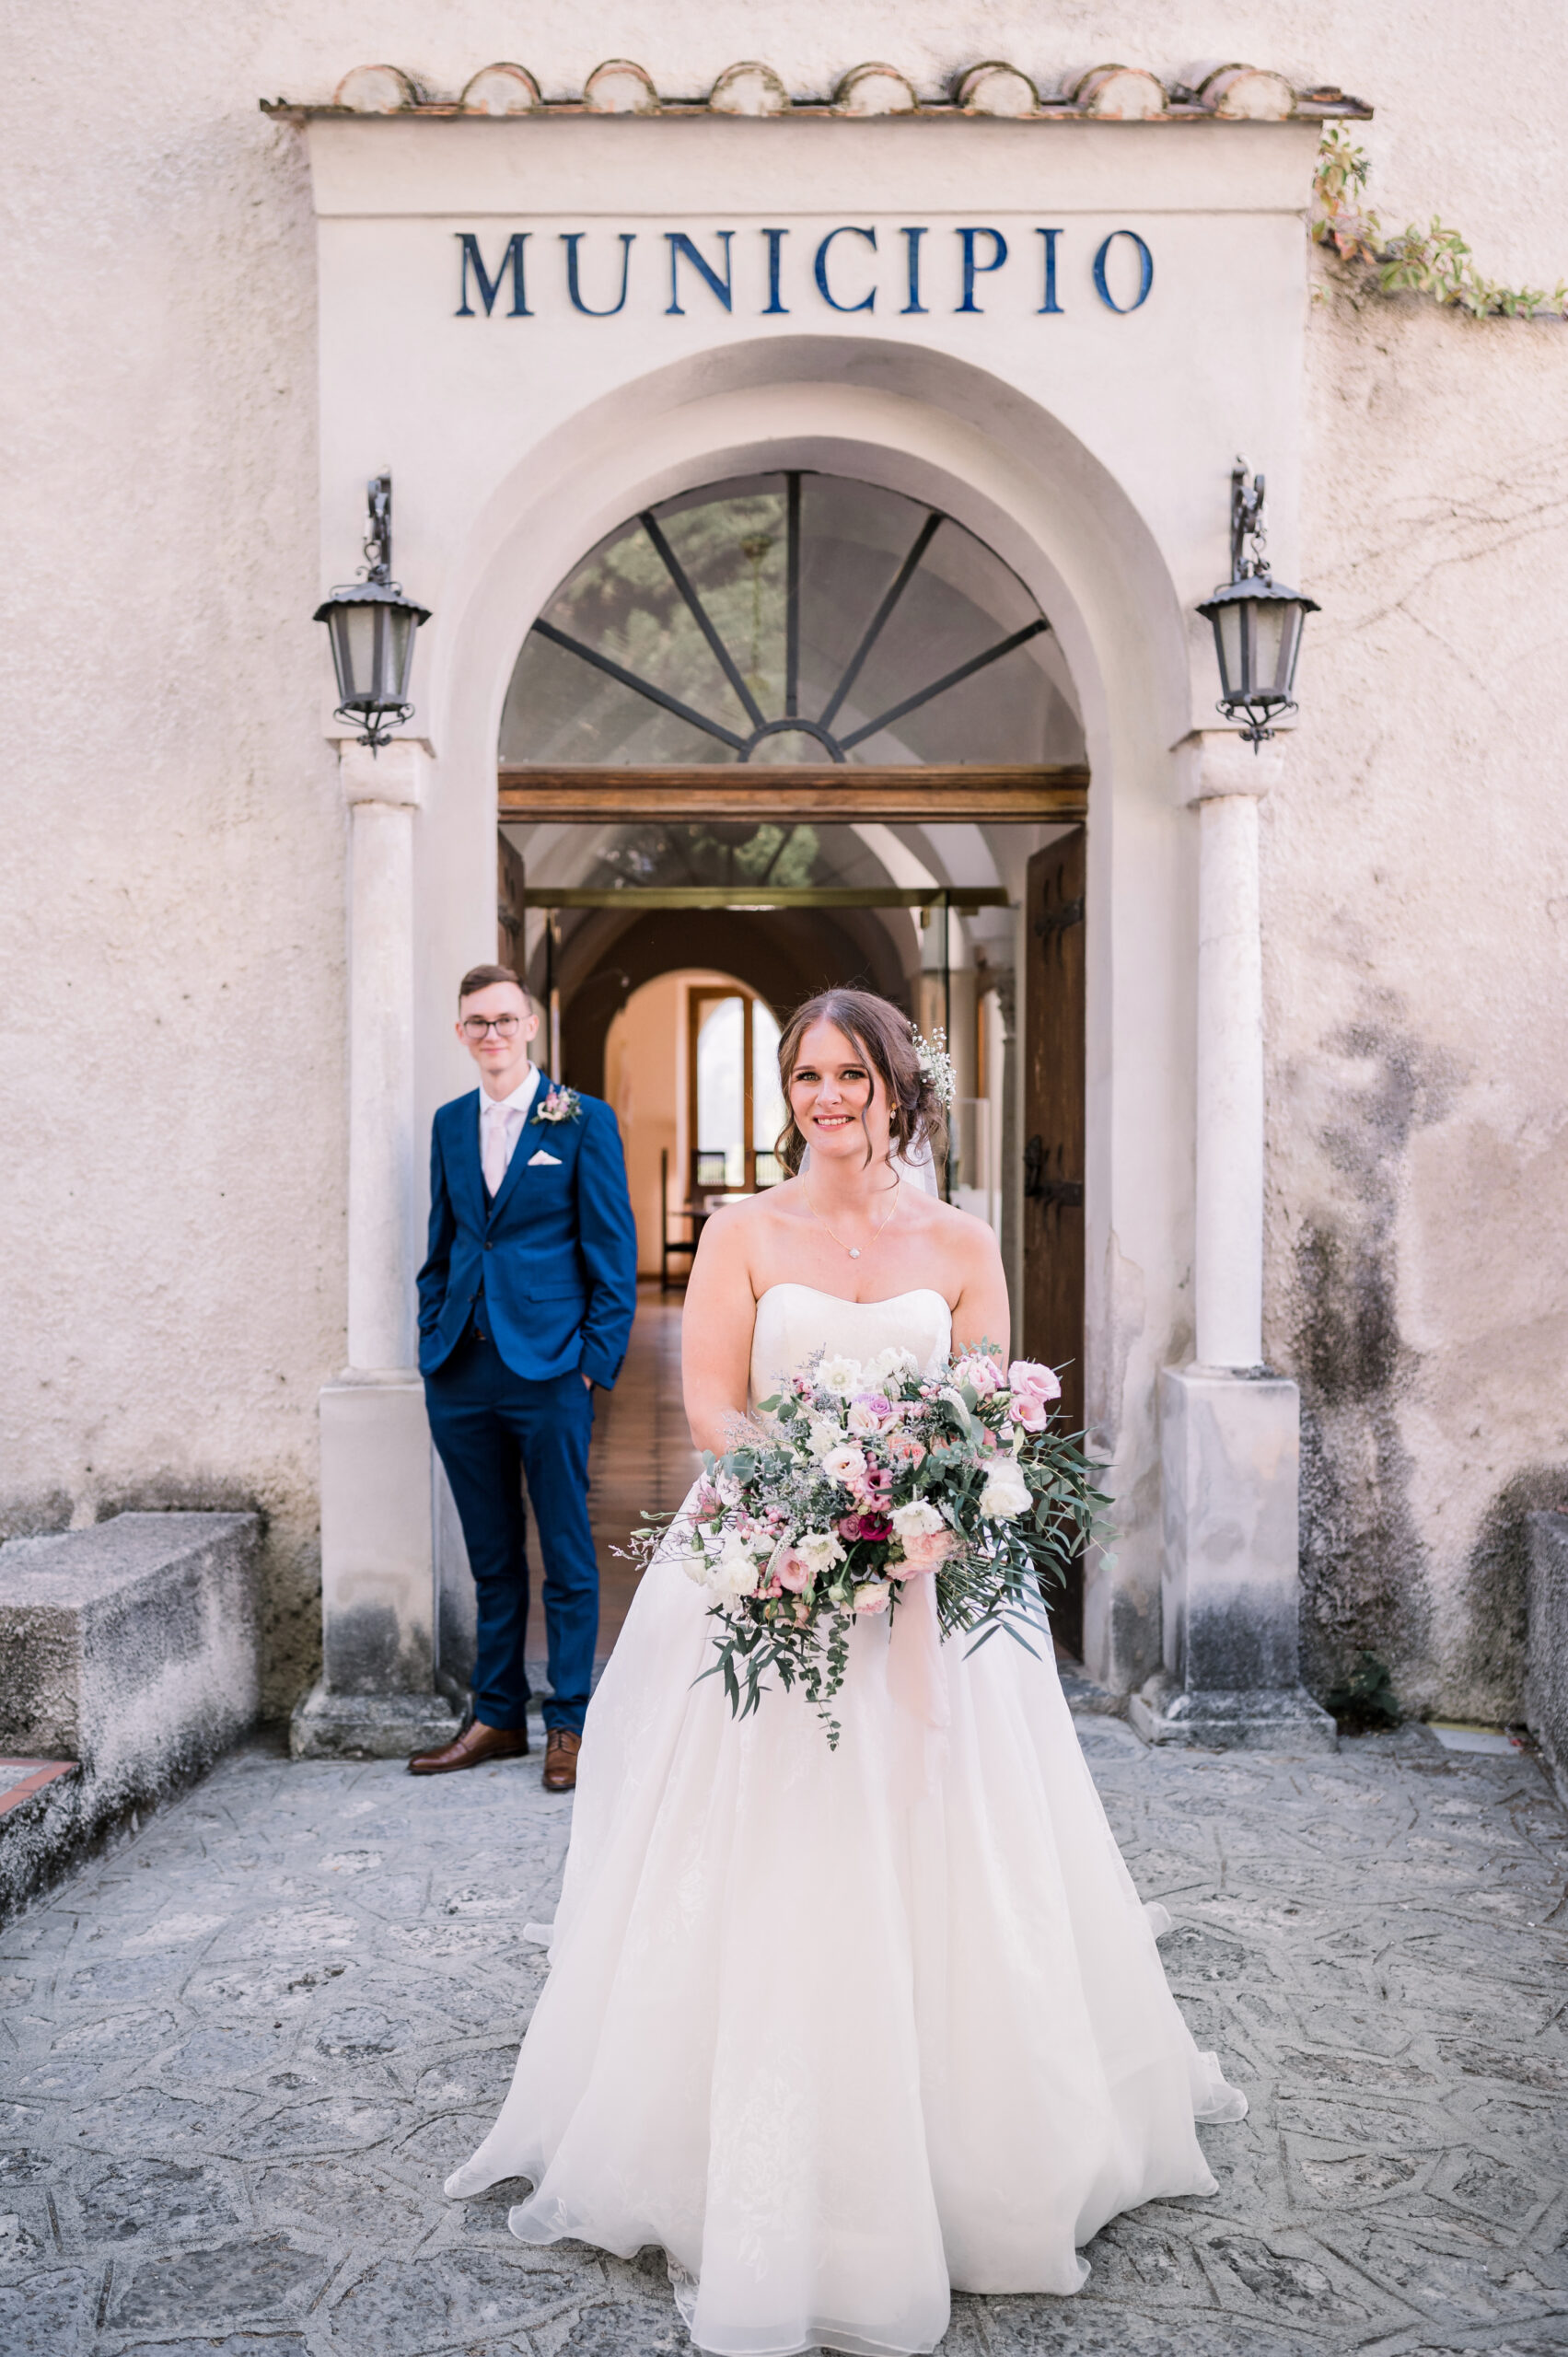 Ben and Holly wedding in Maiori, Amalfi Coast, Italy (3)